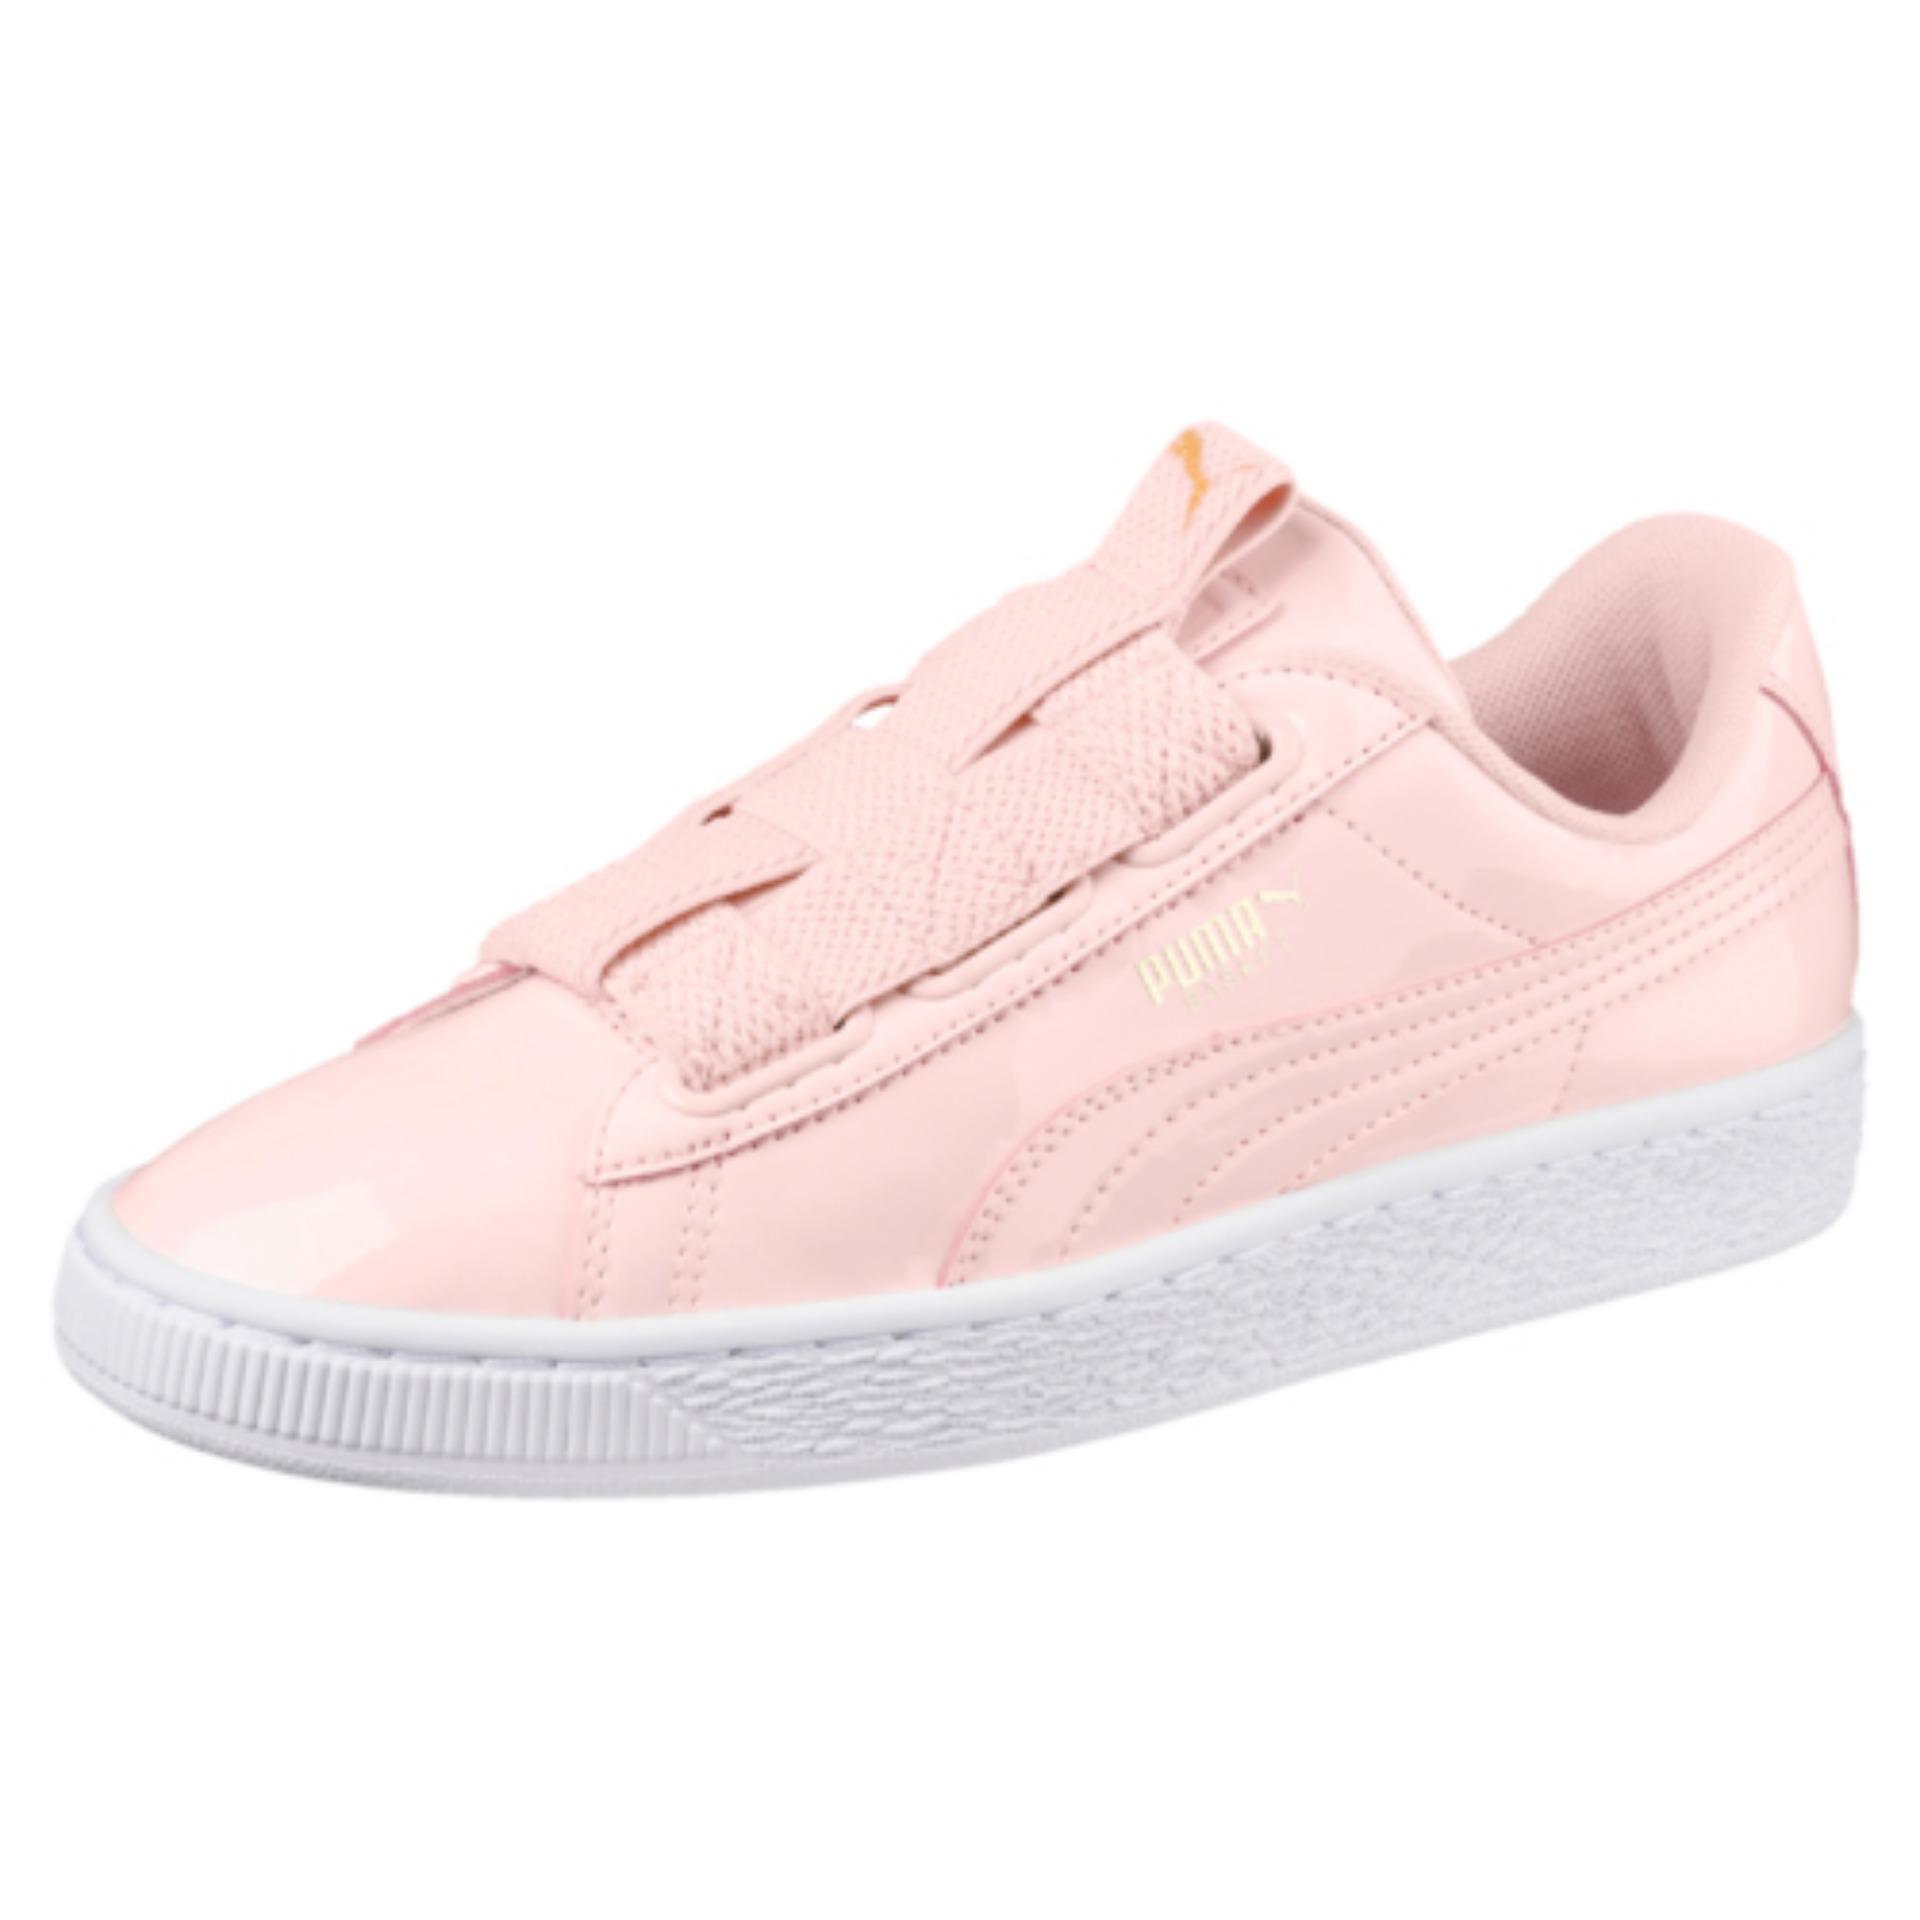 88f2b76cb8f Puma Basket Maze Women Sneakers - Pearl-Puma White